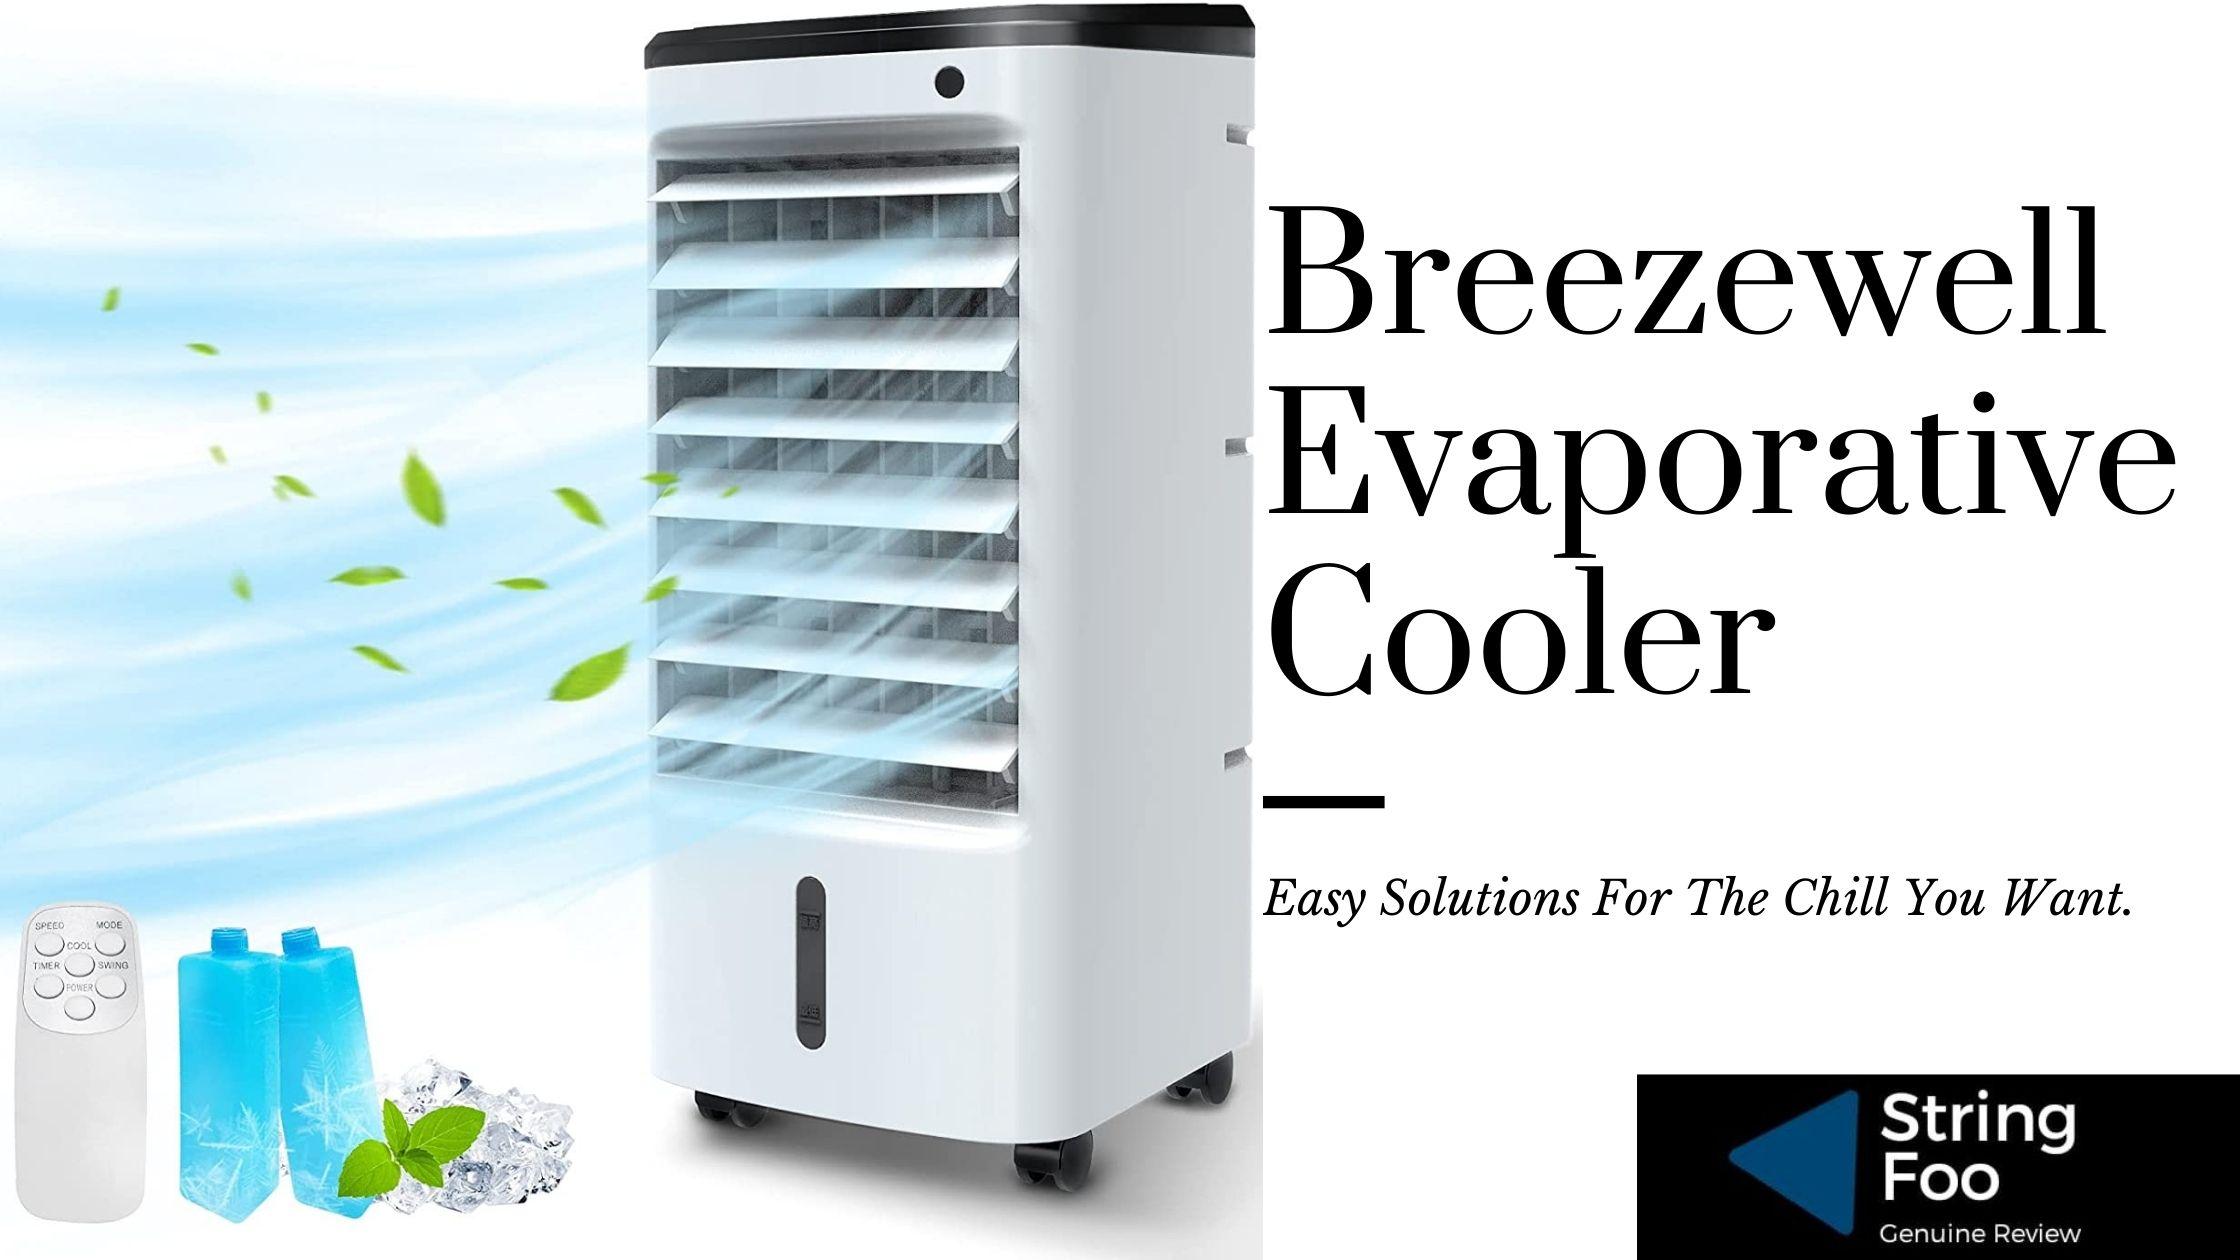 Breezewell Evaporative Cooler